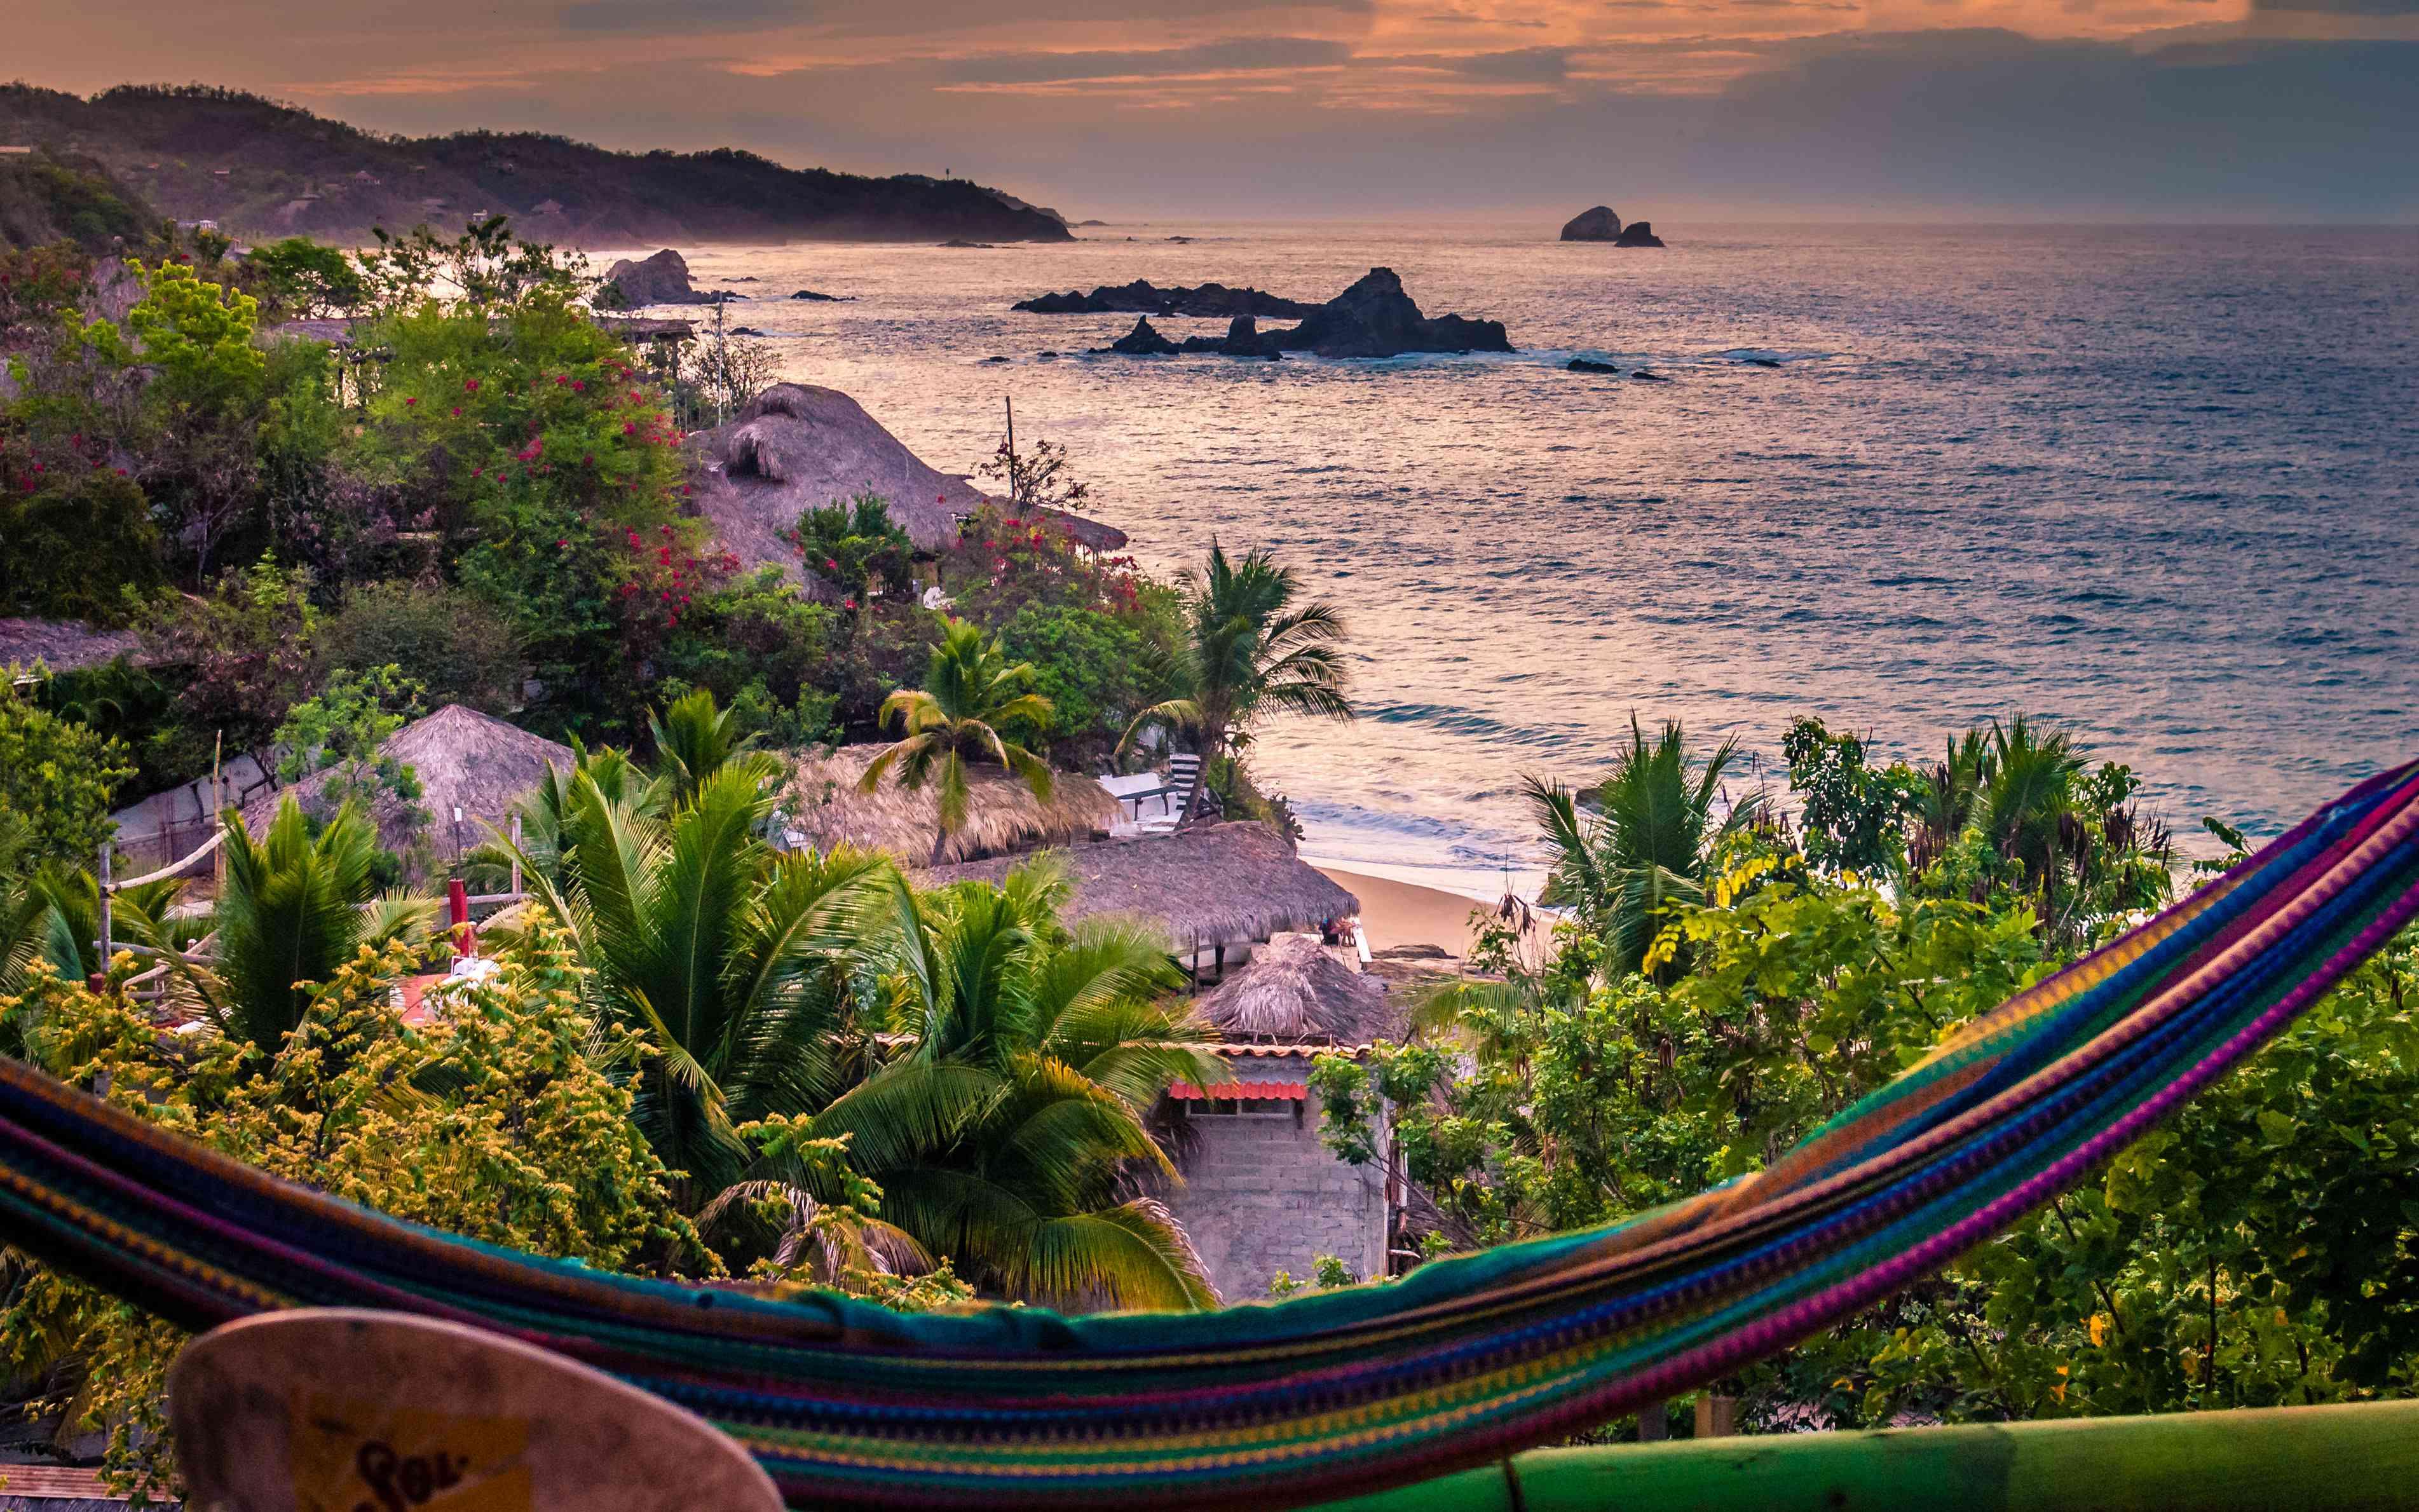 Scenic view of beach at Puerto Escondido, Mexico